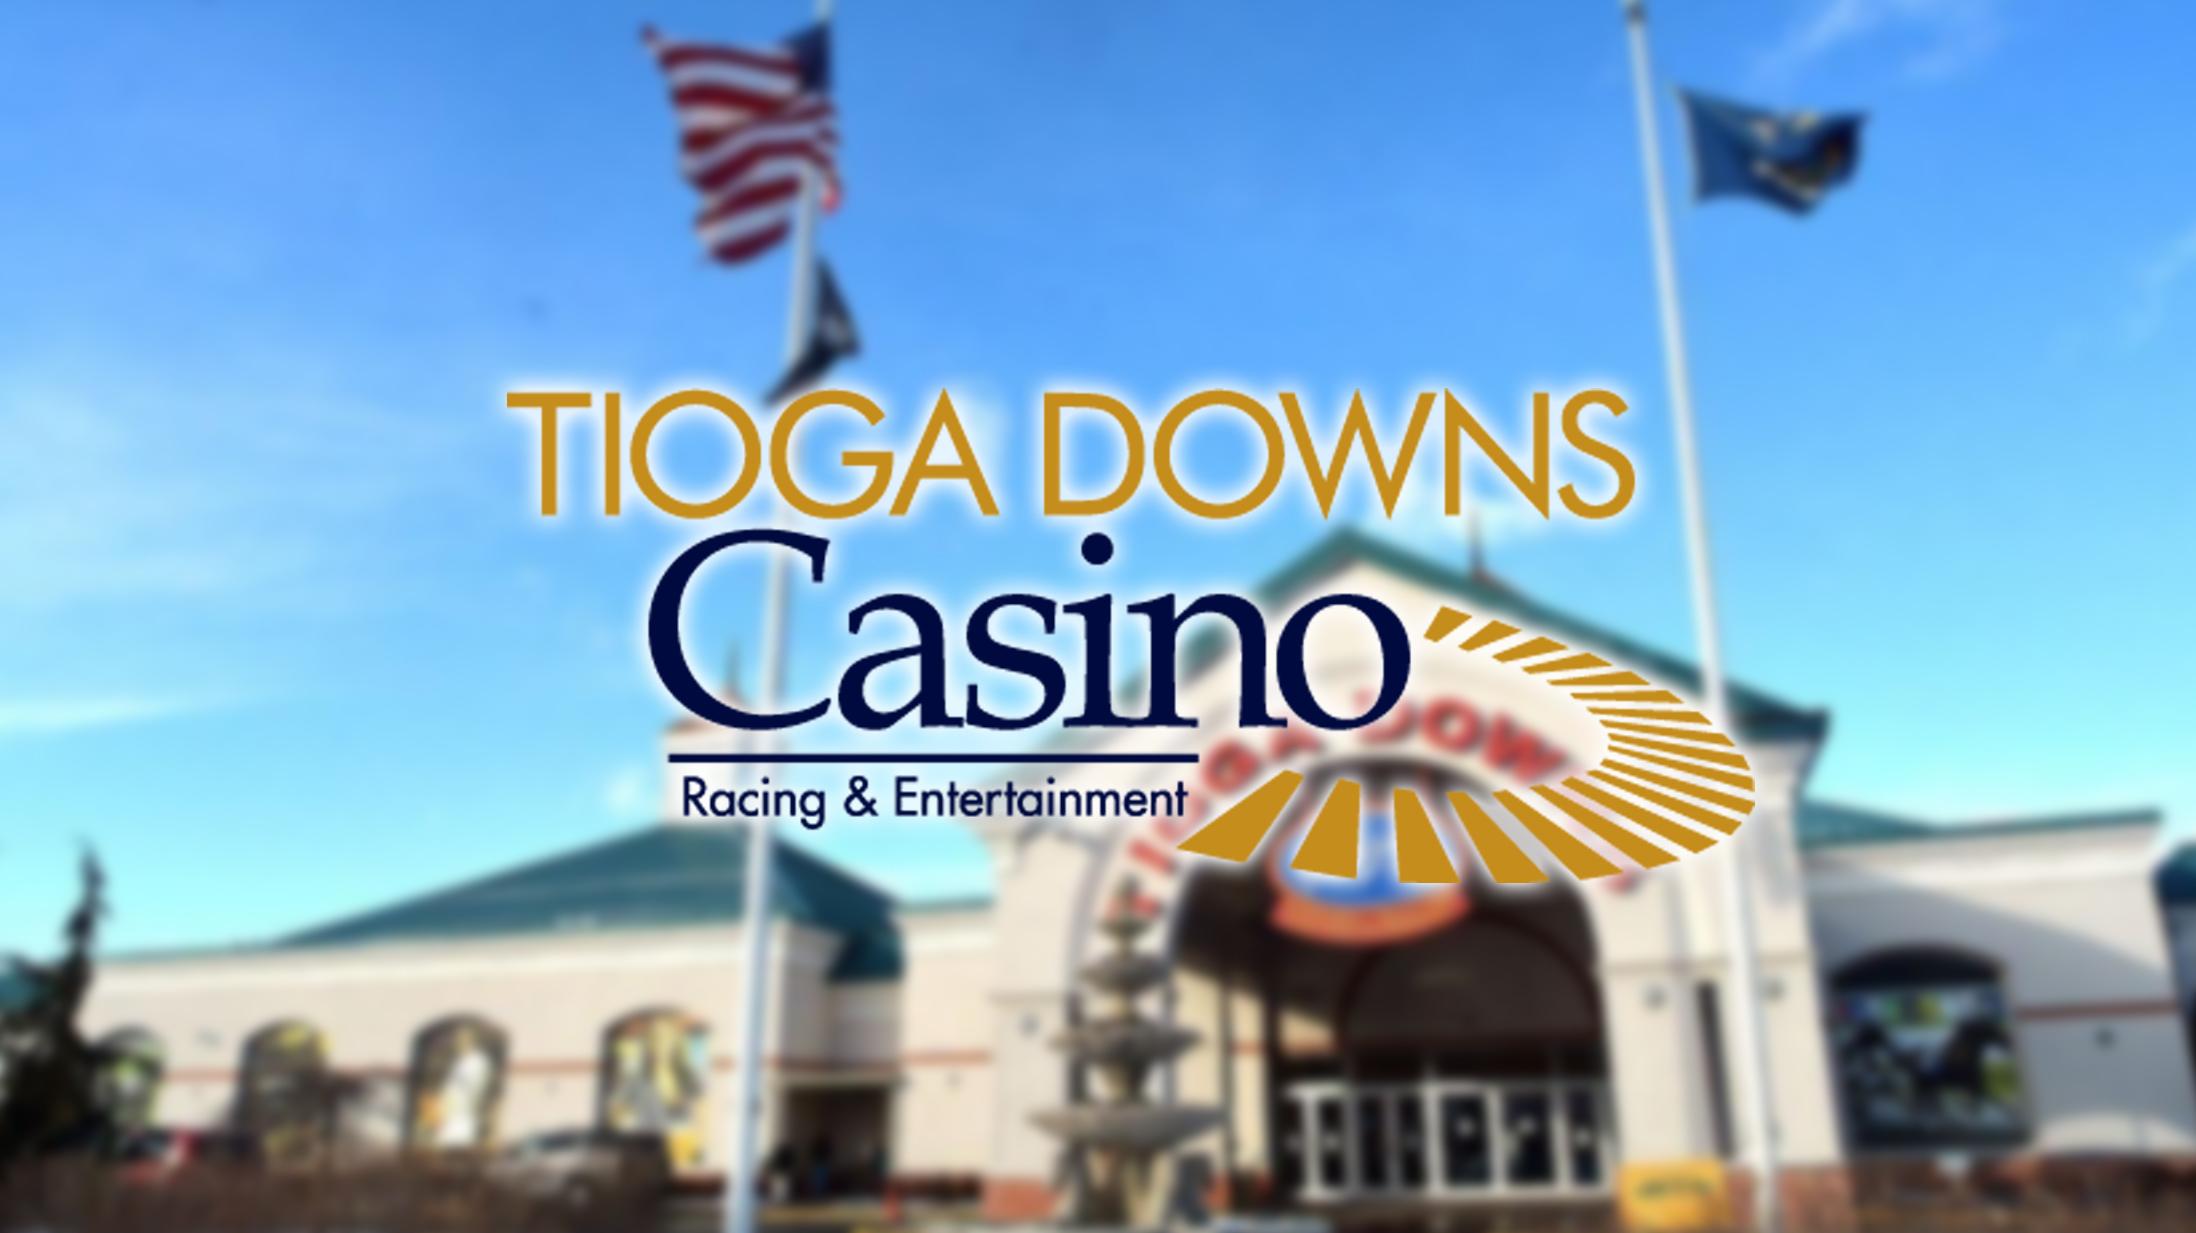 Tioga Downs For WEB 2_1446221300951.jpg